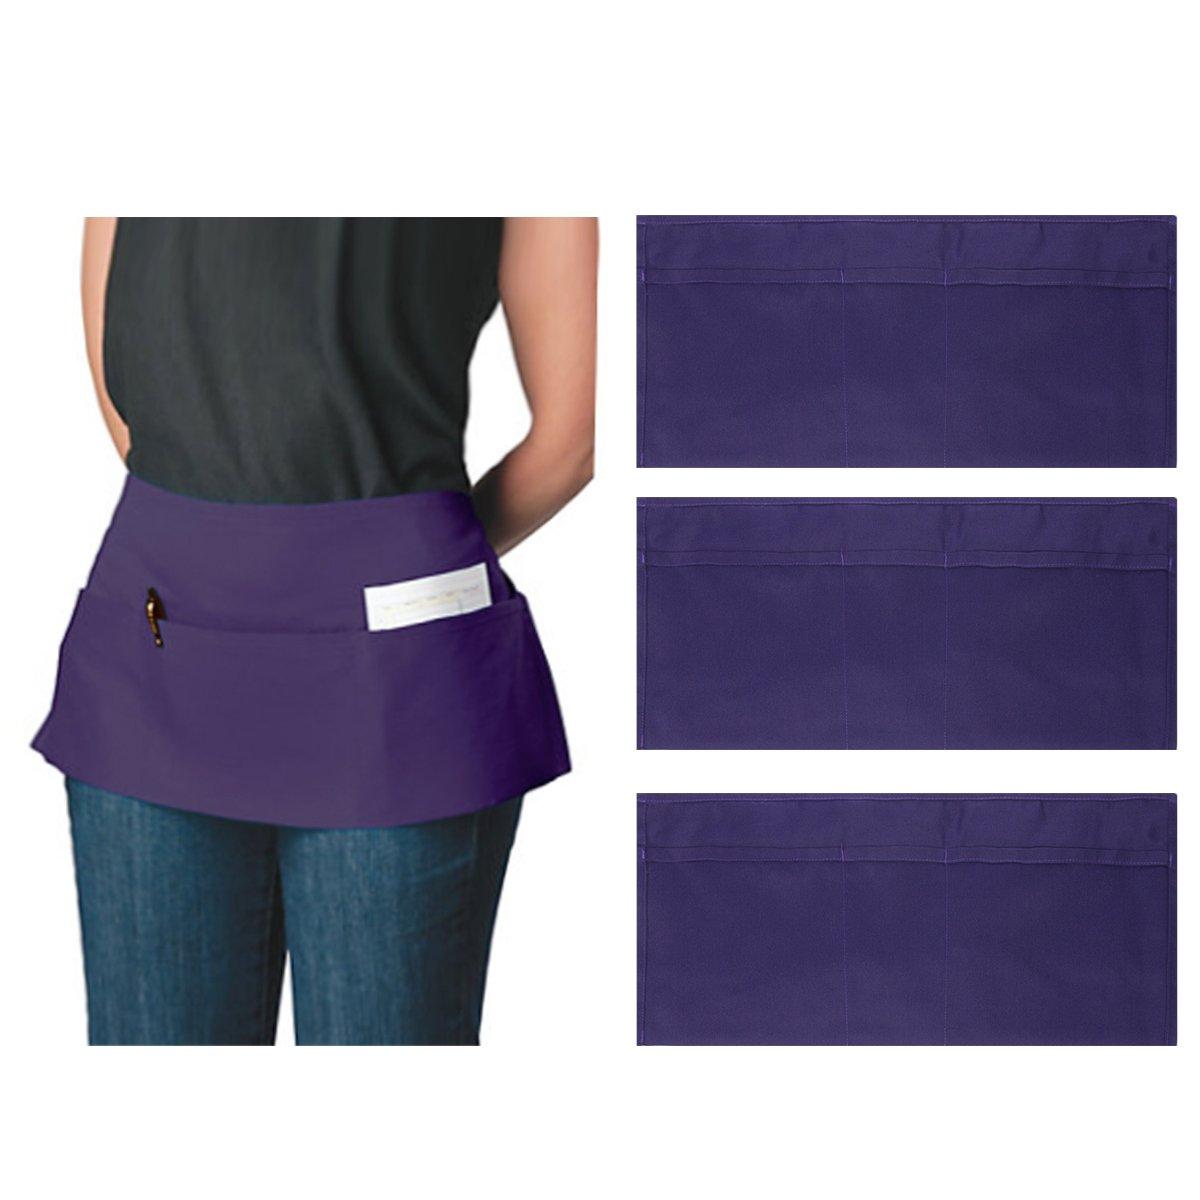 Ataly 3-Pocket Canvas Waist Aprons for Women & Men Bulk Set Short Waitress Waiter Server Half Apron